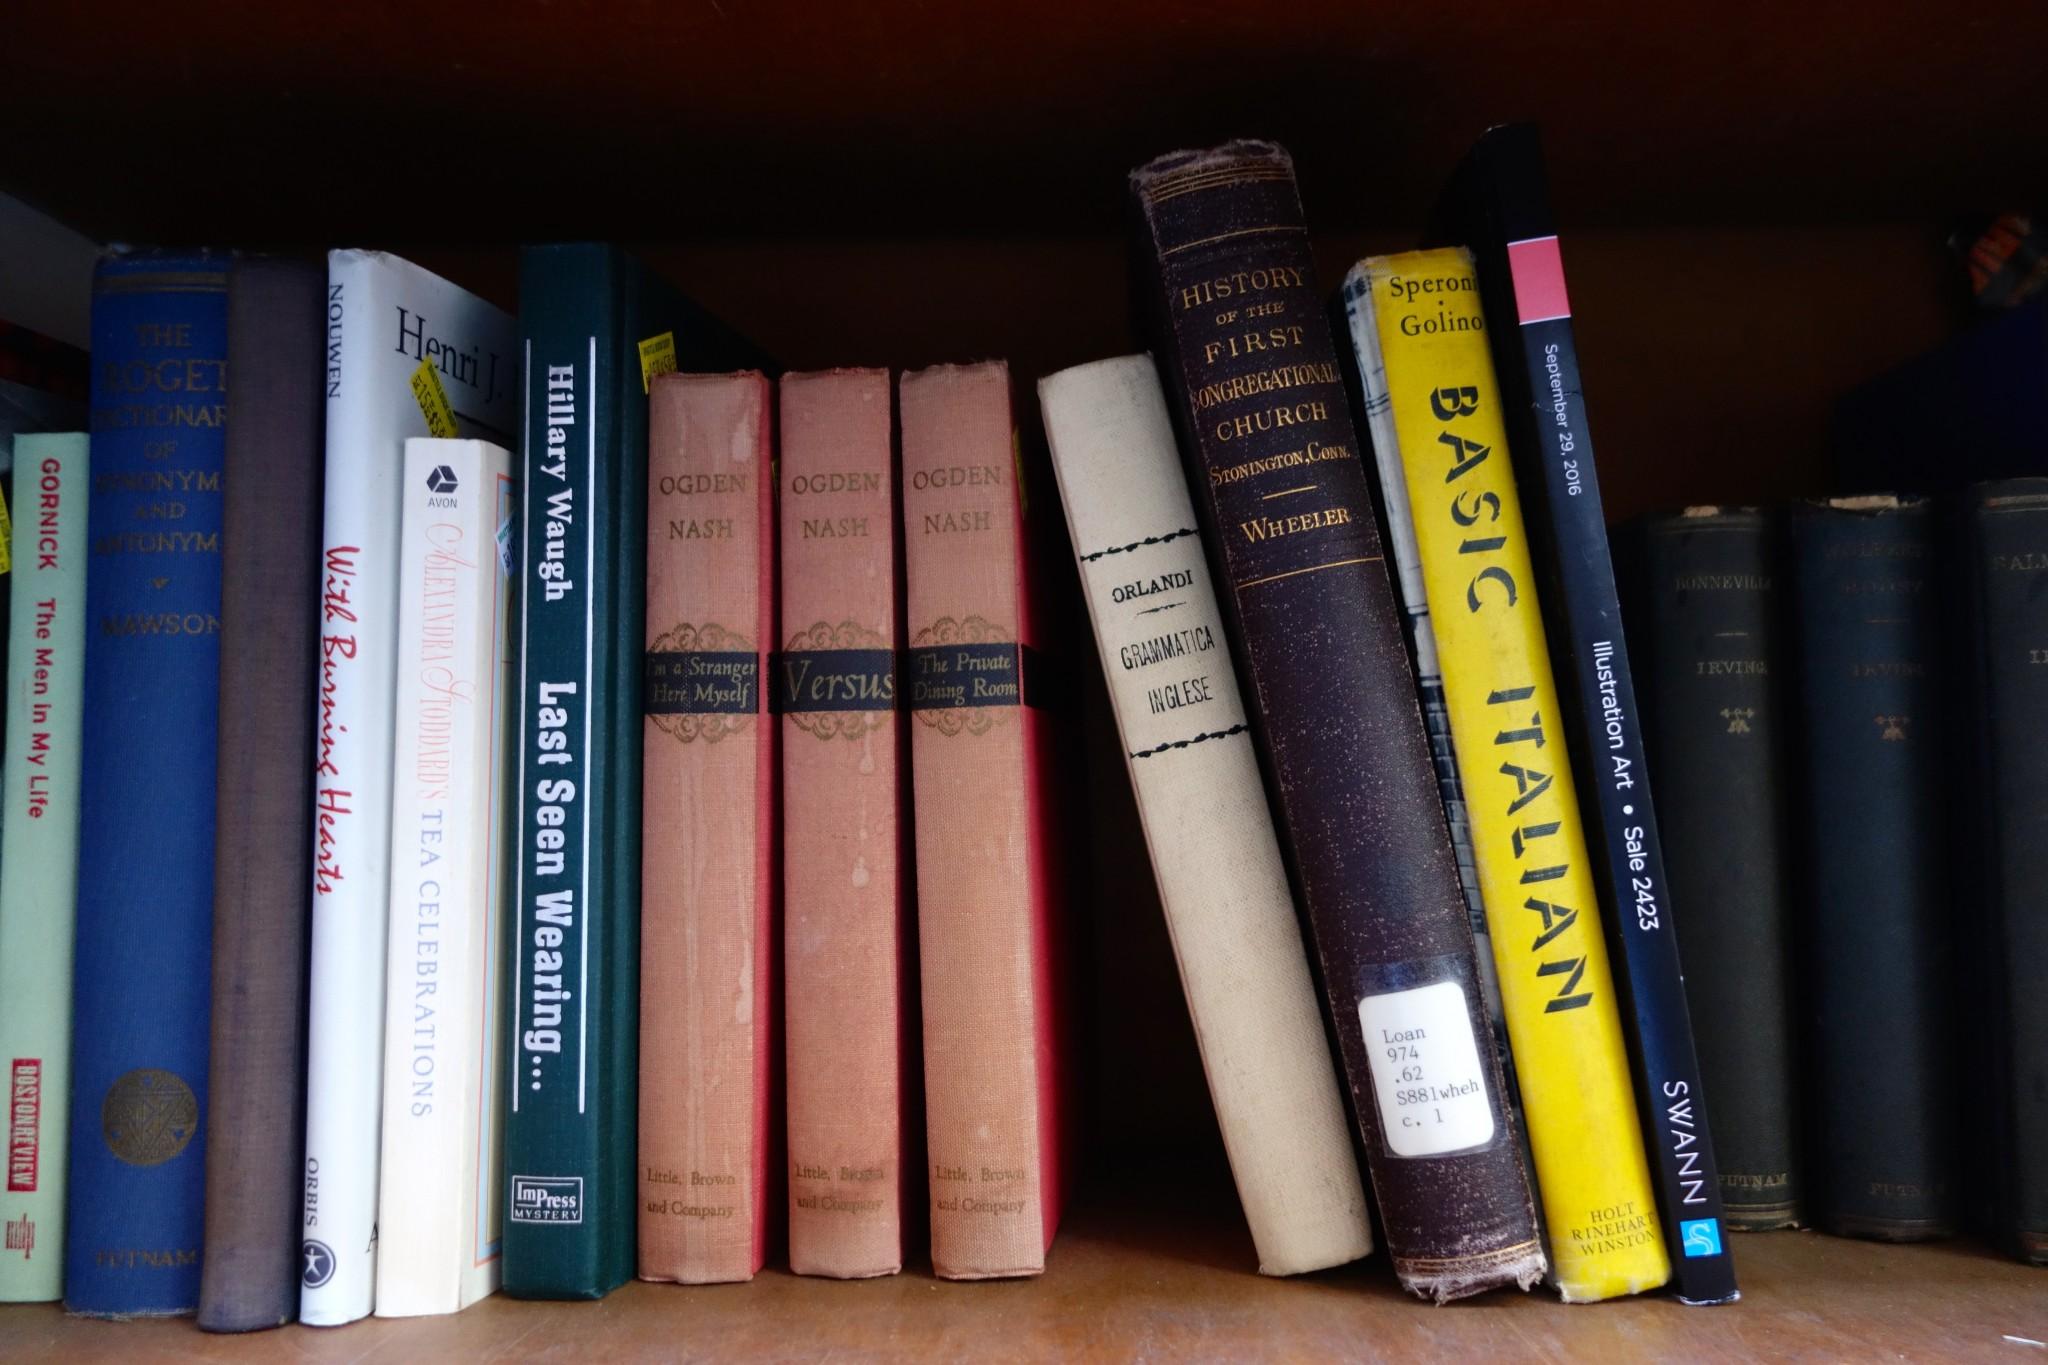 brattle book shop, the-alyst.com